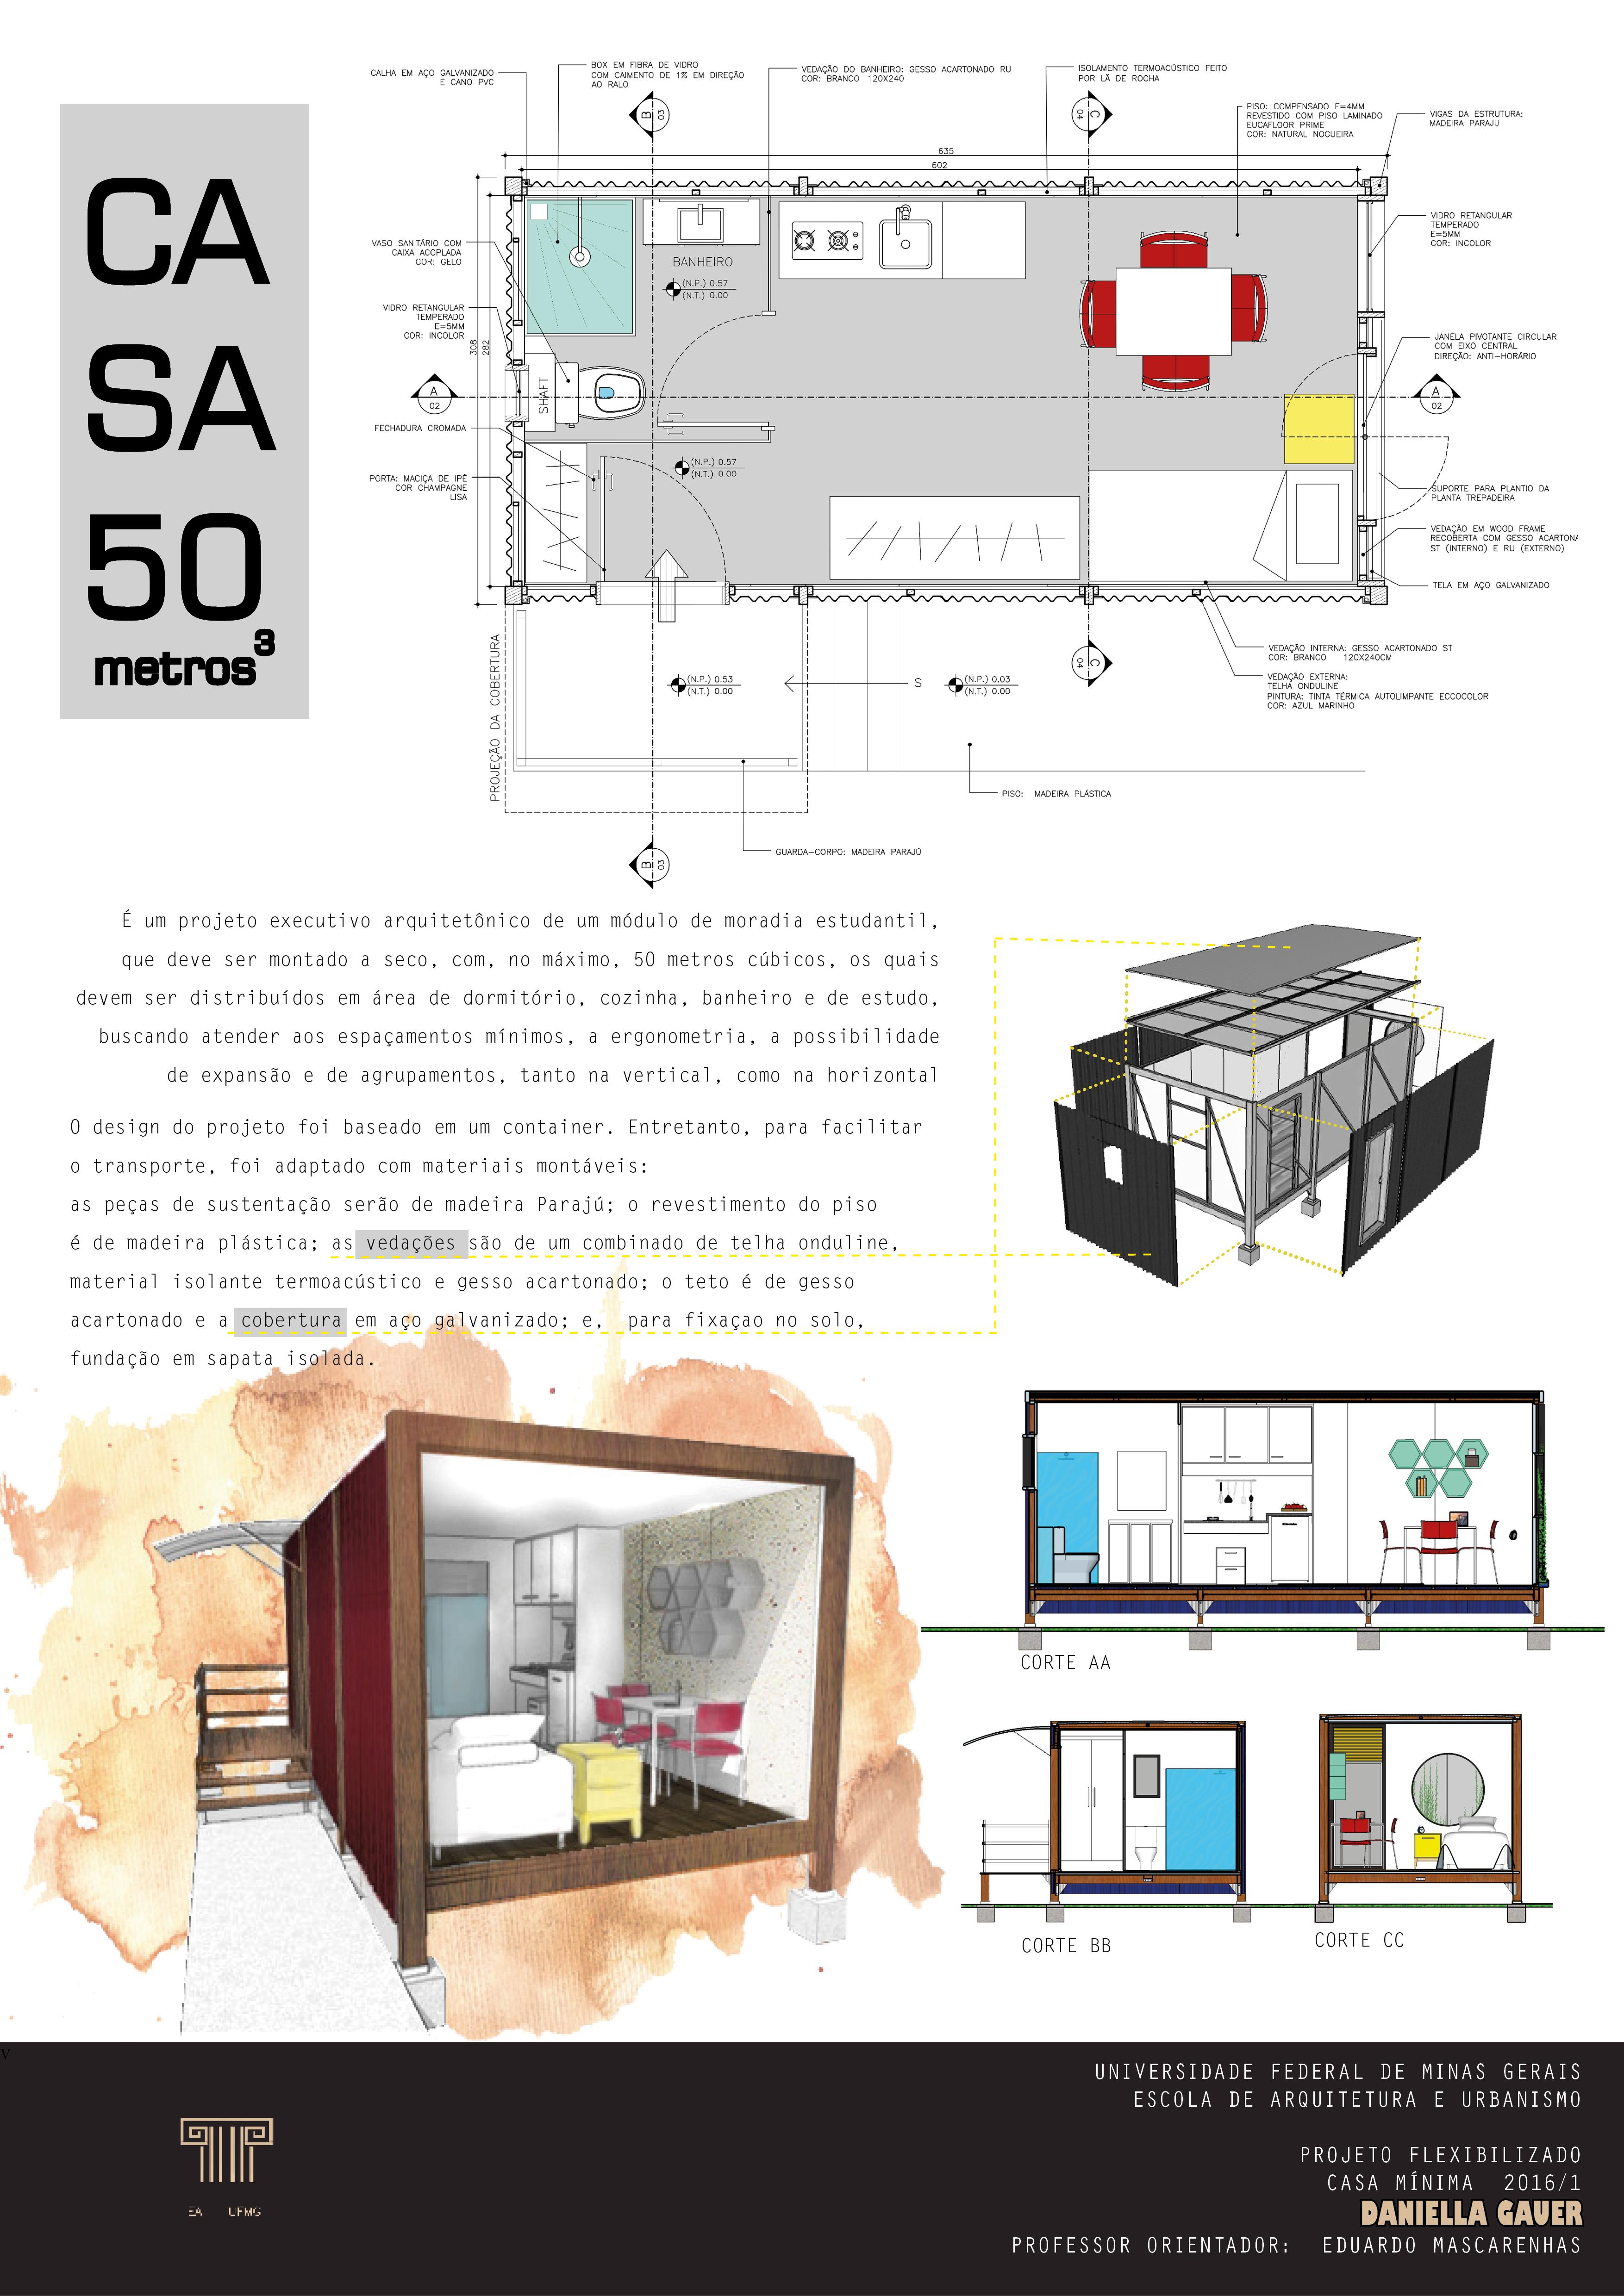 Prancha Resumo Casa 50m Autoria Daniella Gauer Softwares Adobe